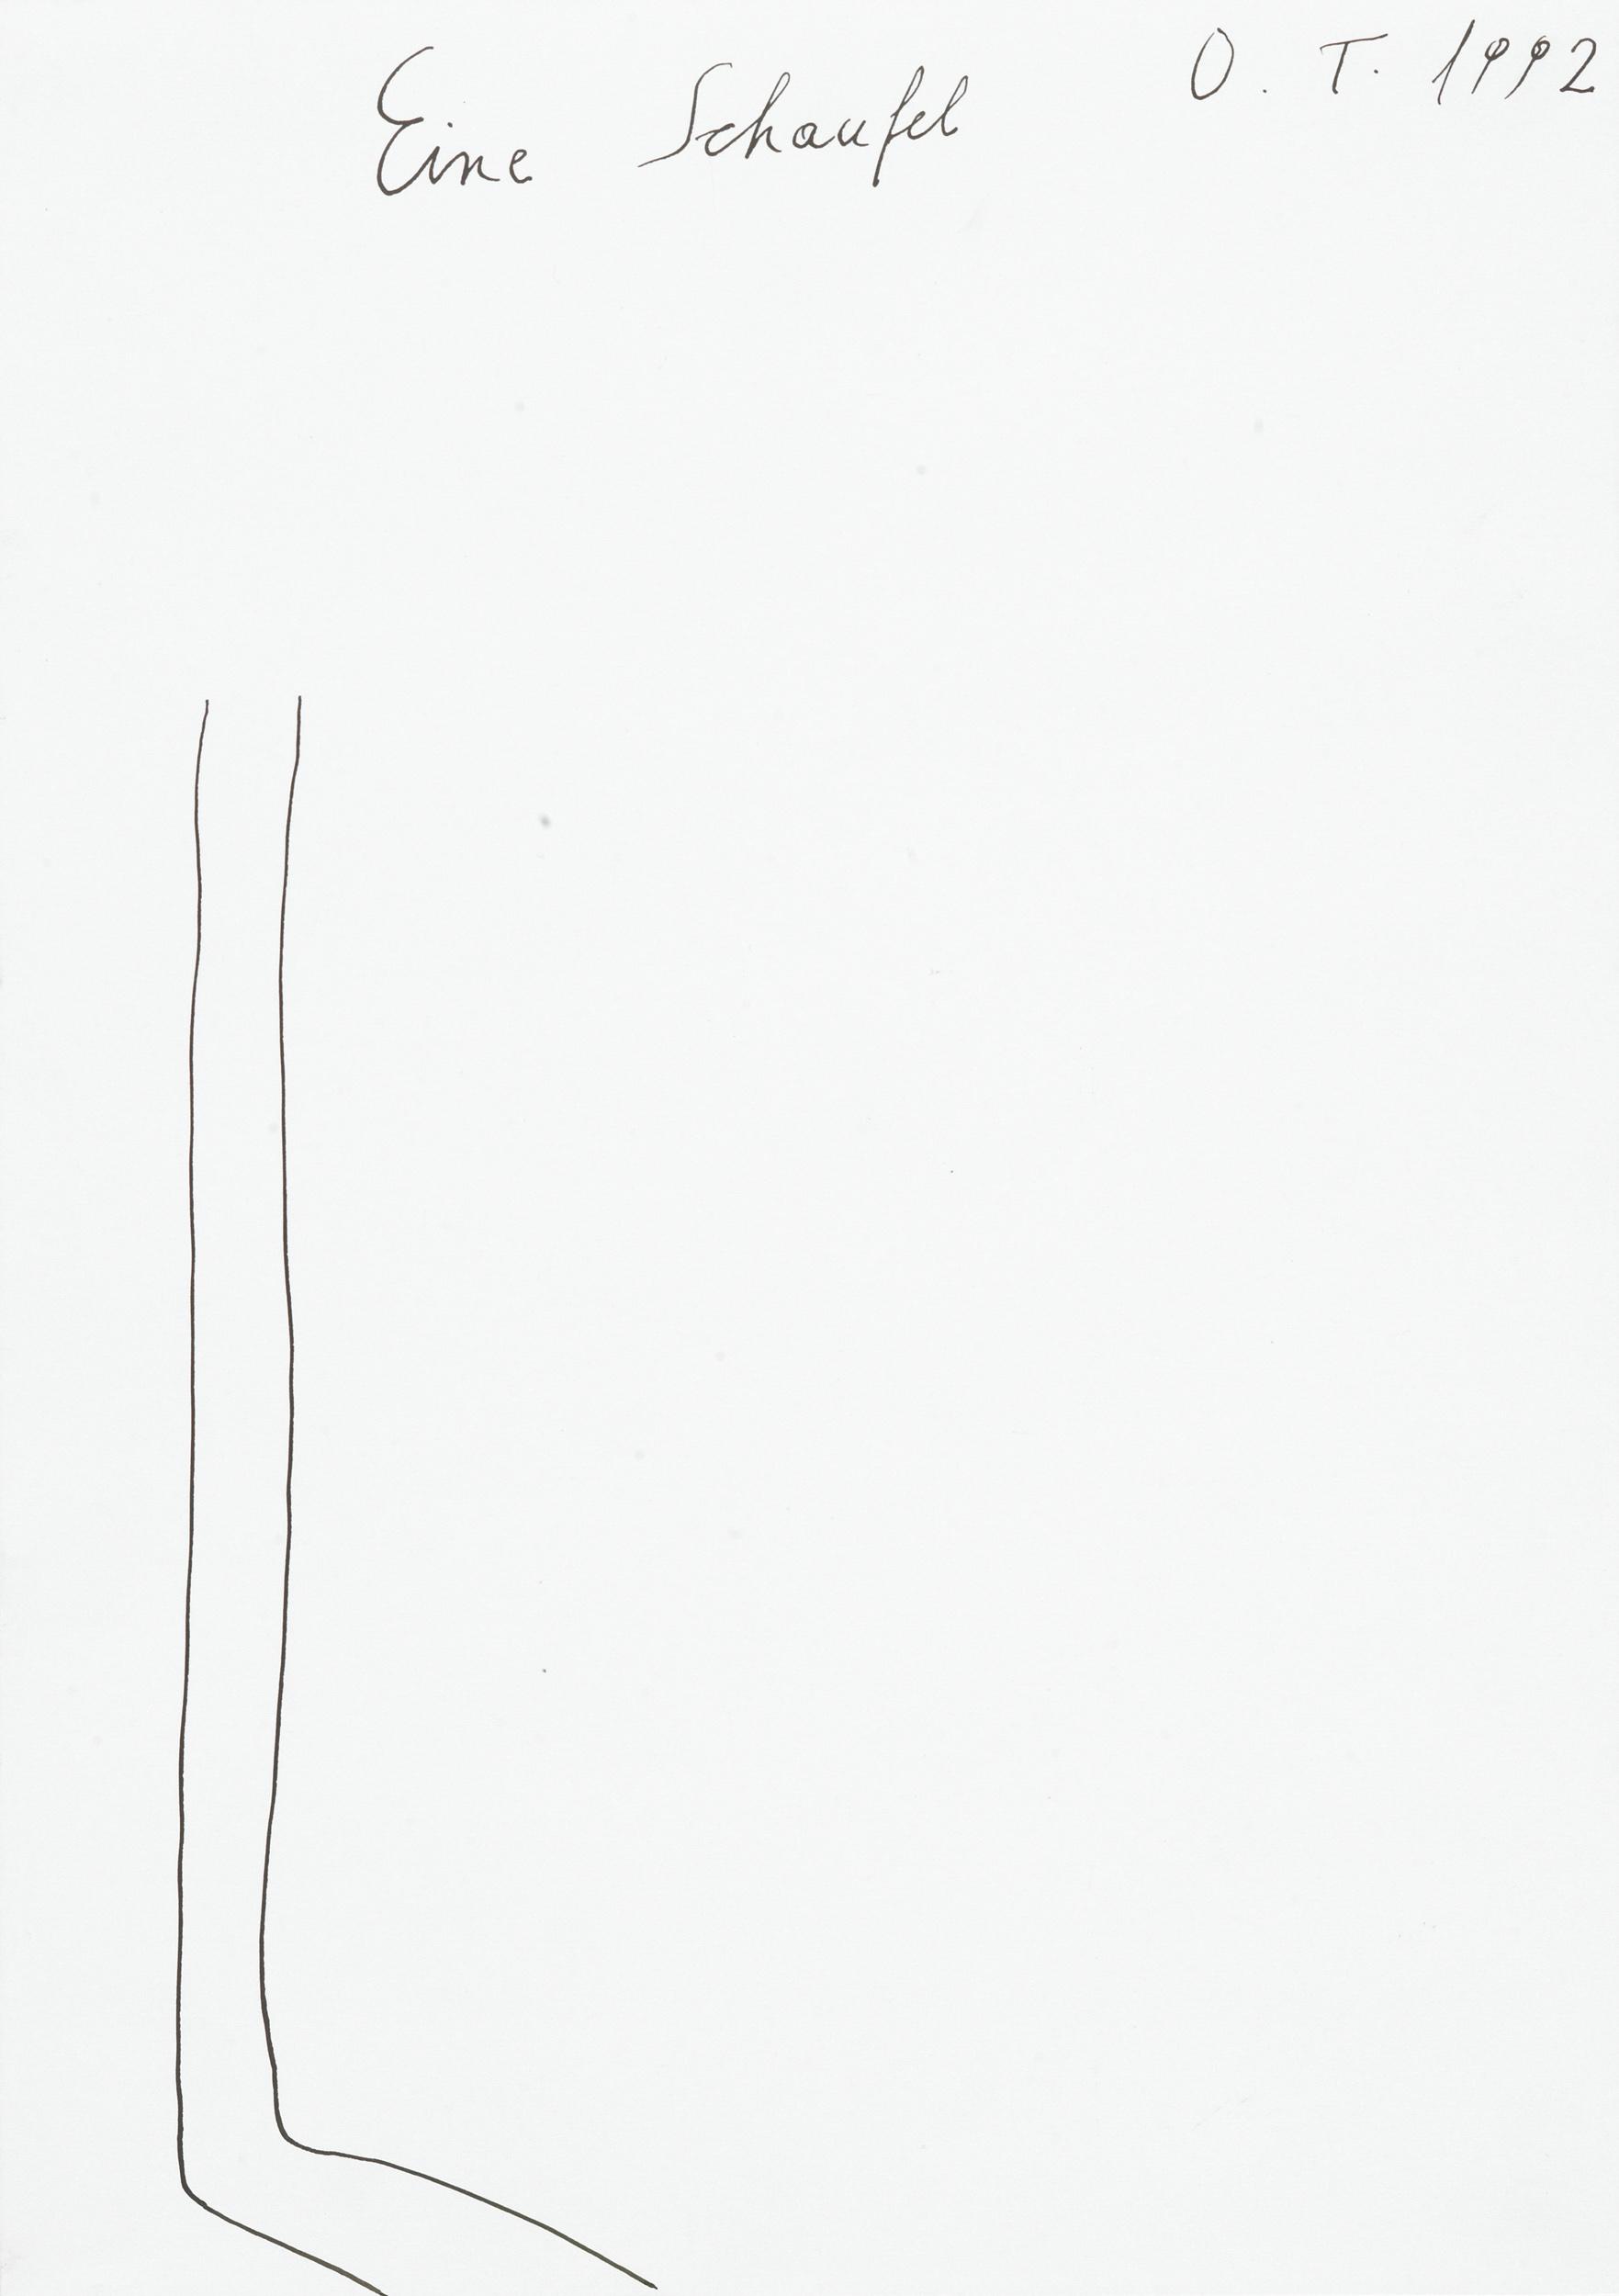 tschirtner oswald - Eine Schaufel / A shovel